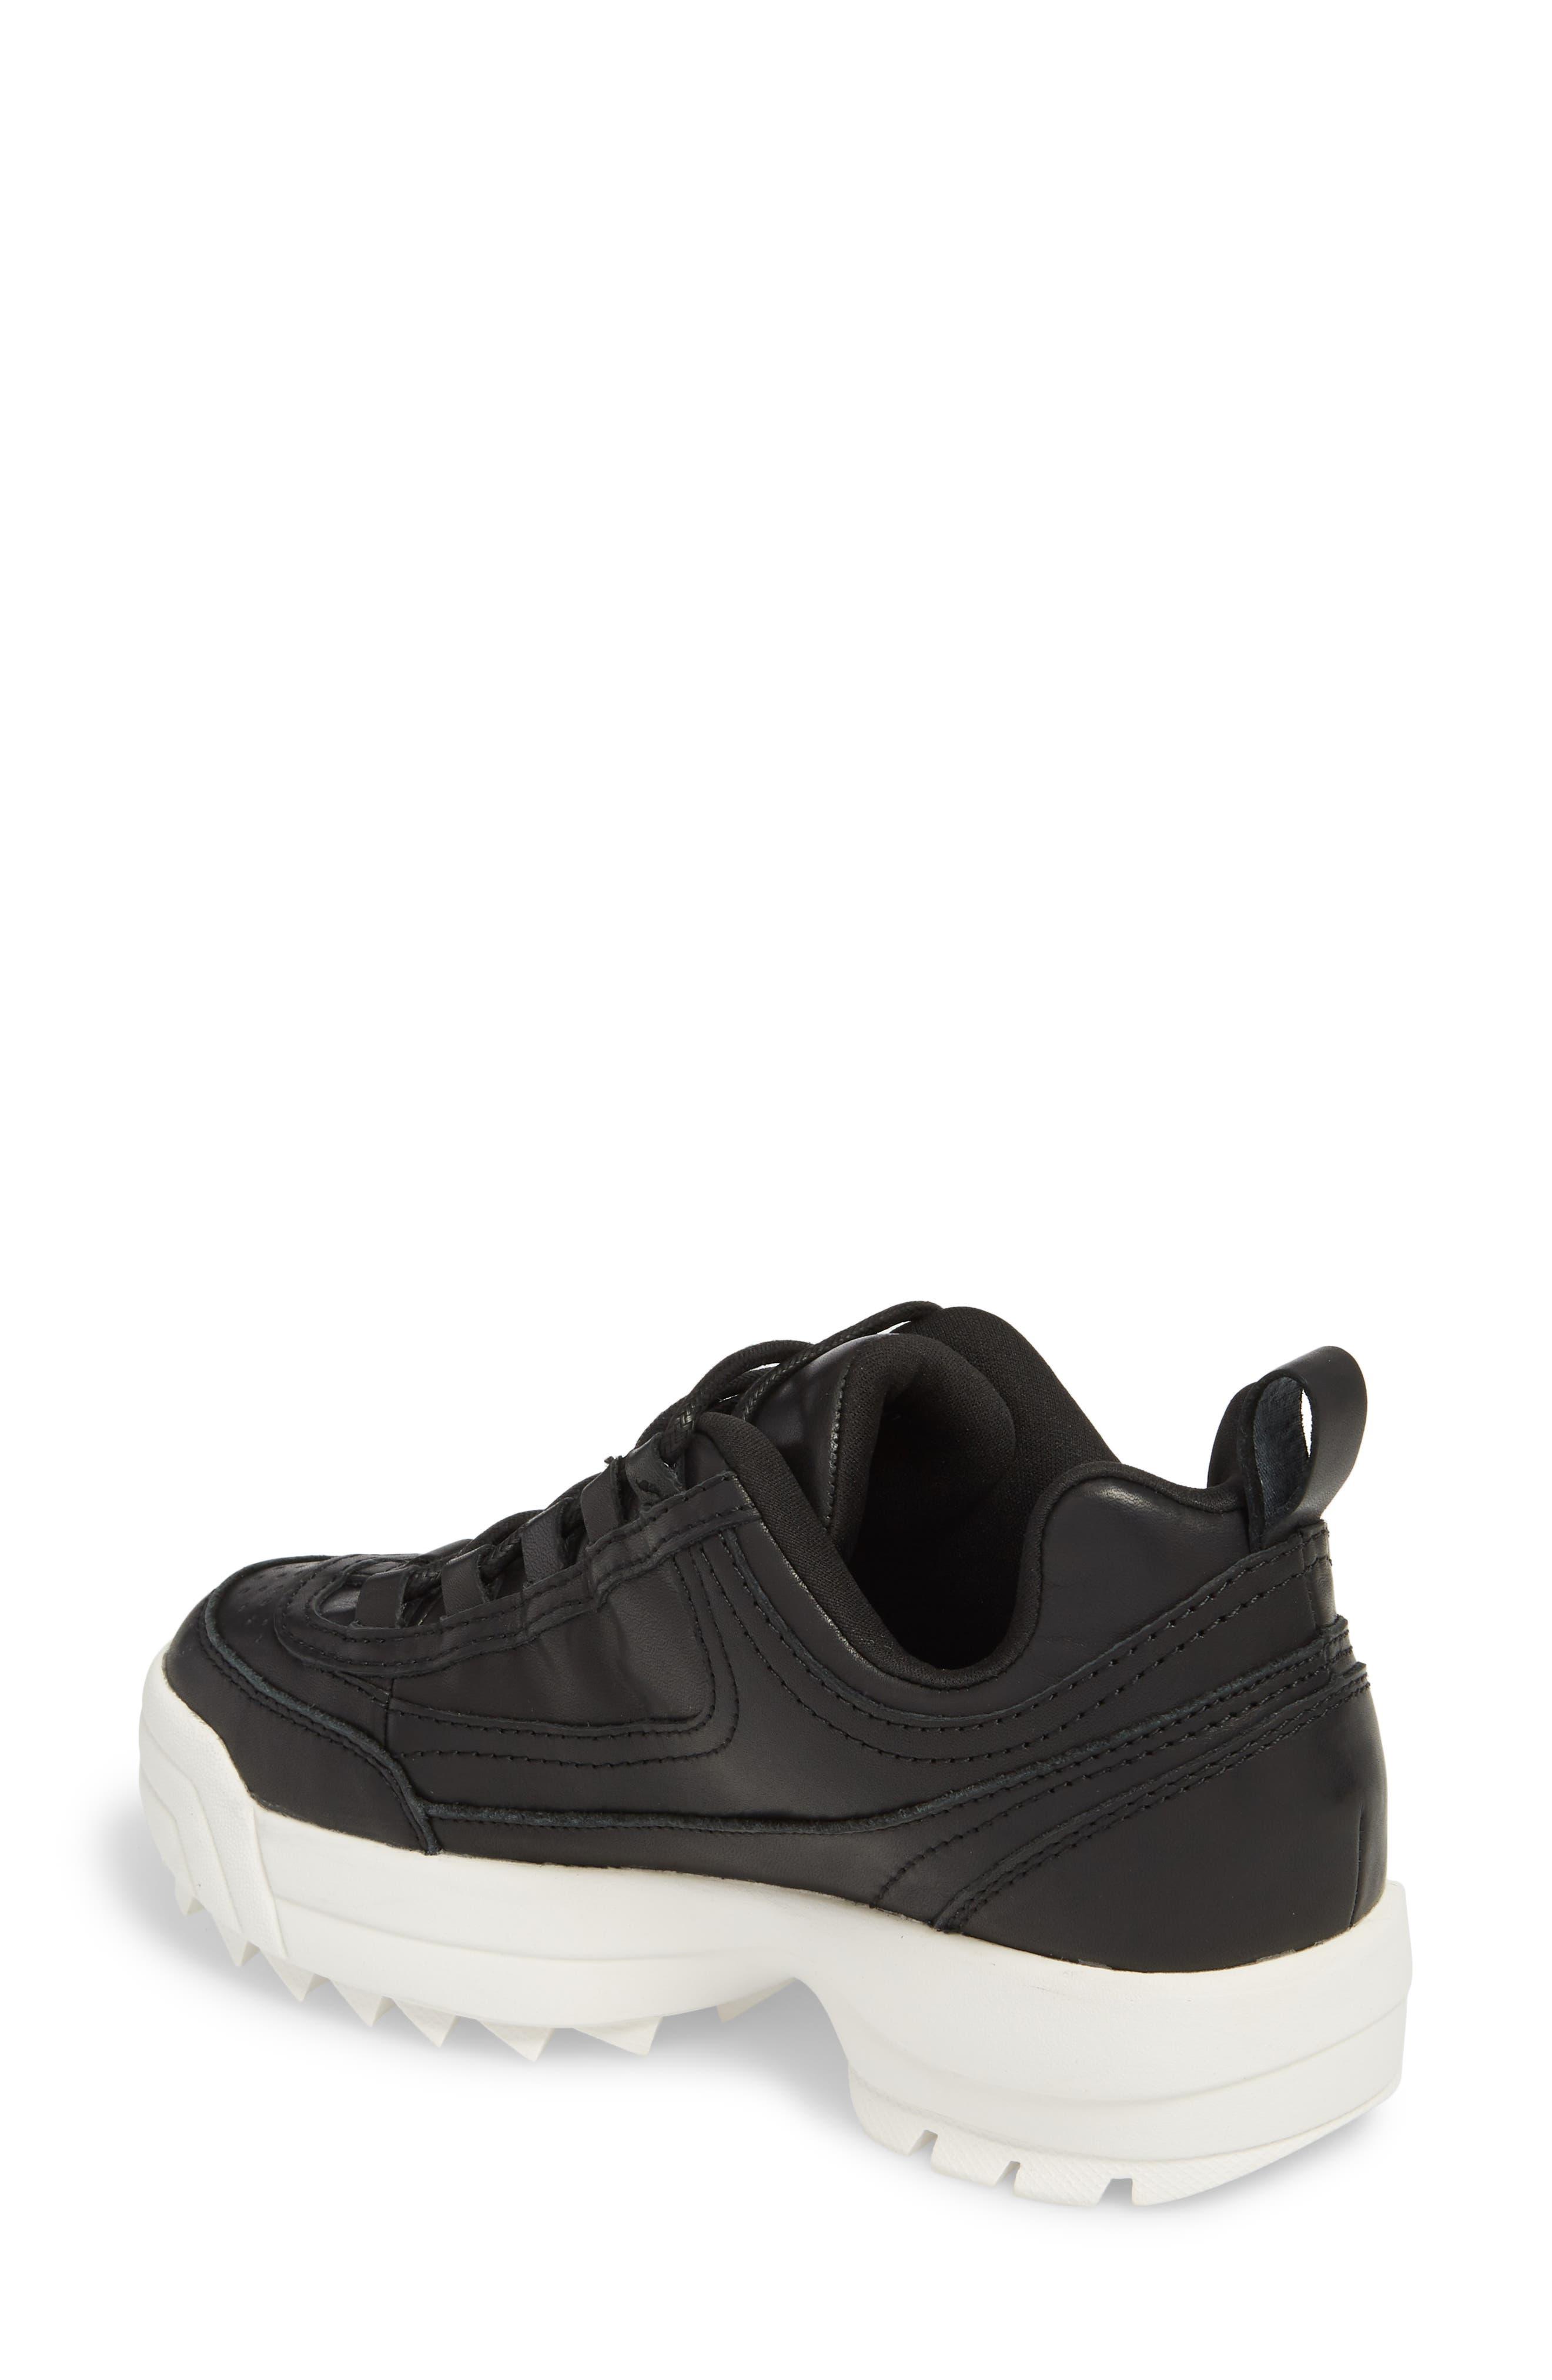 Sidekick Platform Sneaker,                             Alternate thumbnail 2, color,                             001